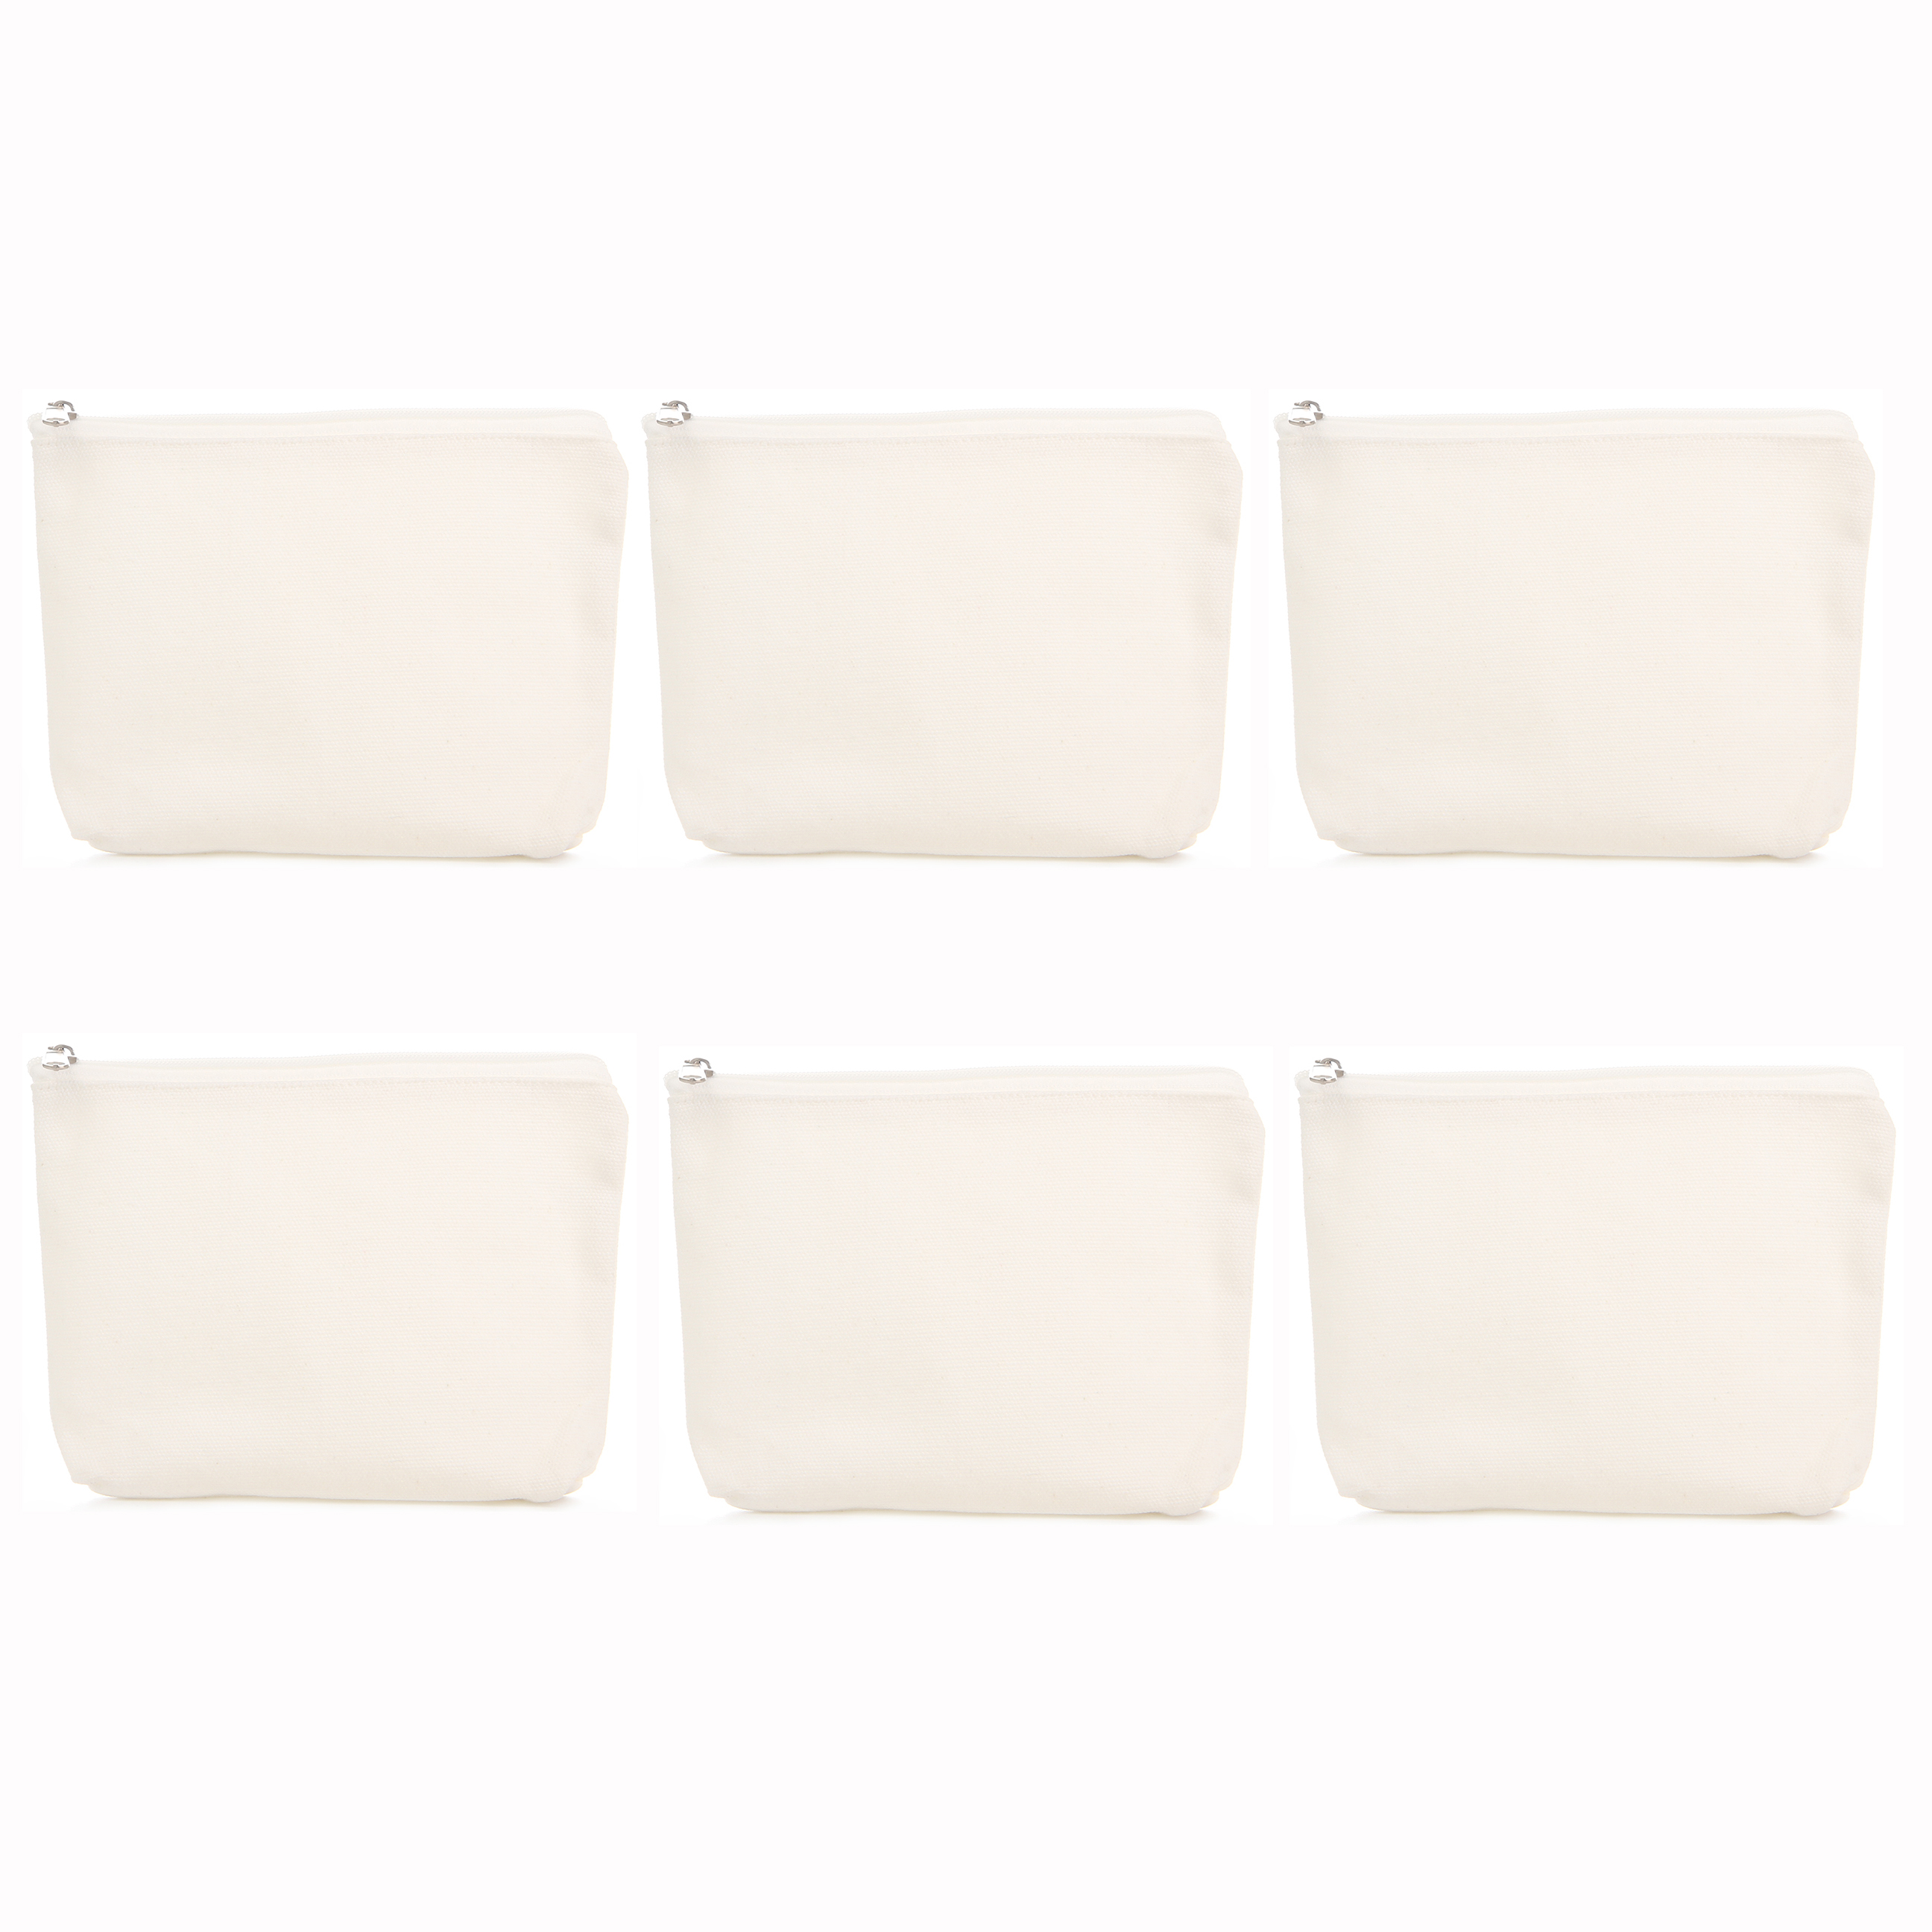 6Pcs/Lot Make-Up Bag DIY Cotton Pure White Zipper Case Canvas Simple Travel Cosmetic Bag